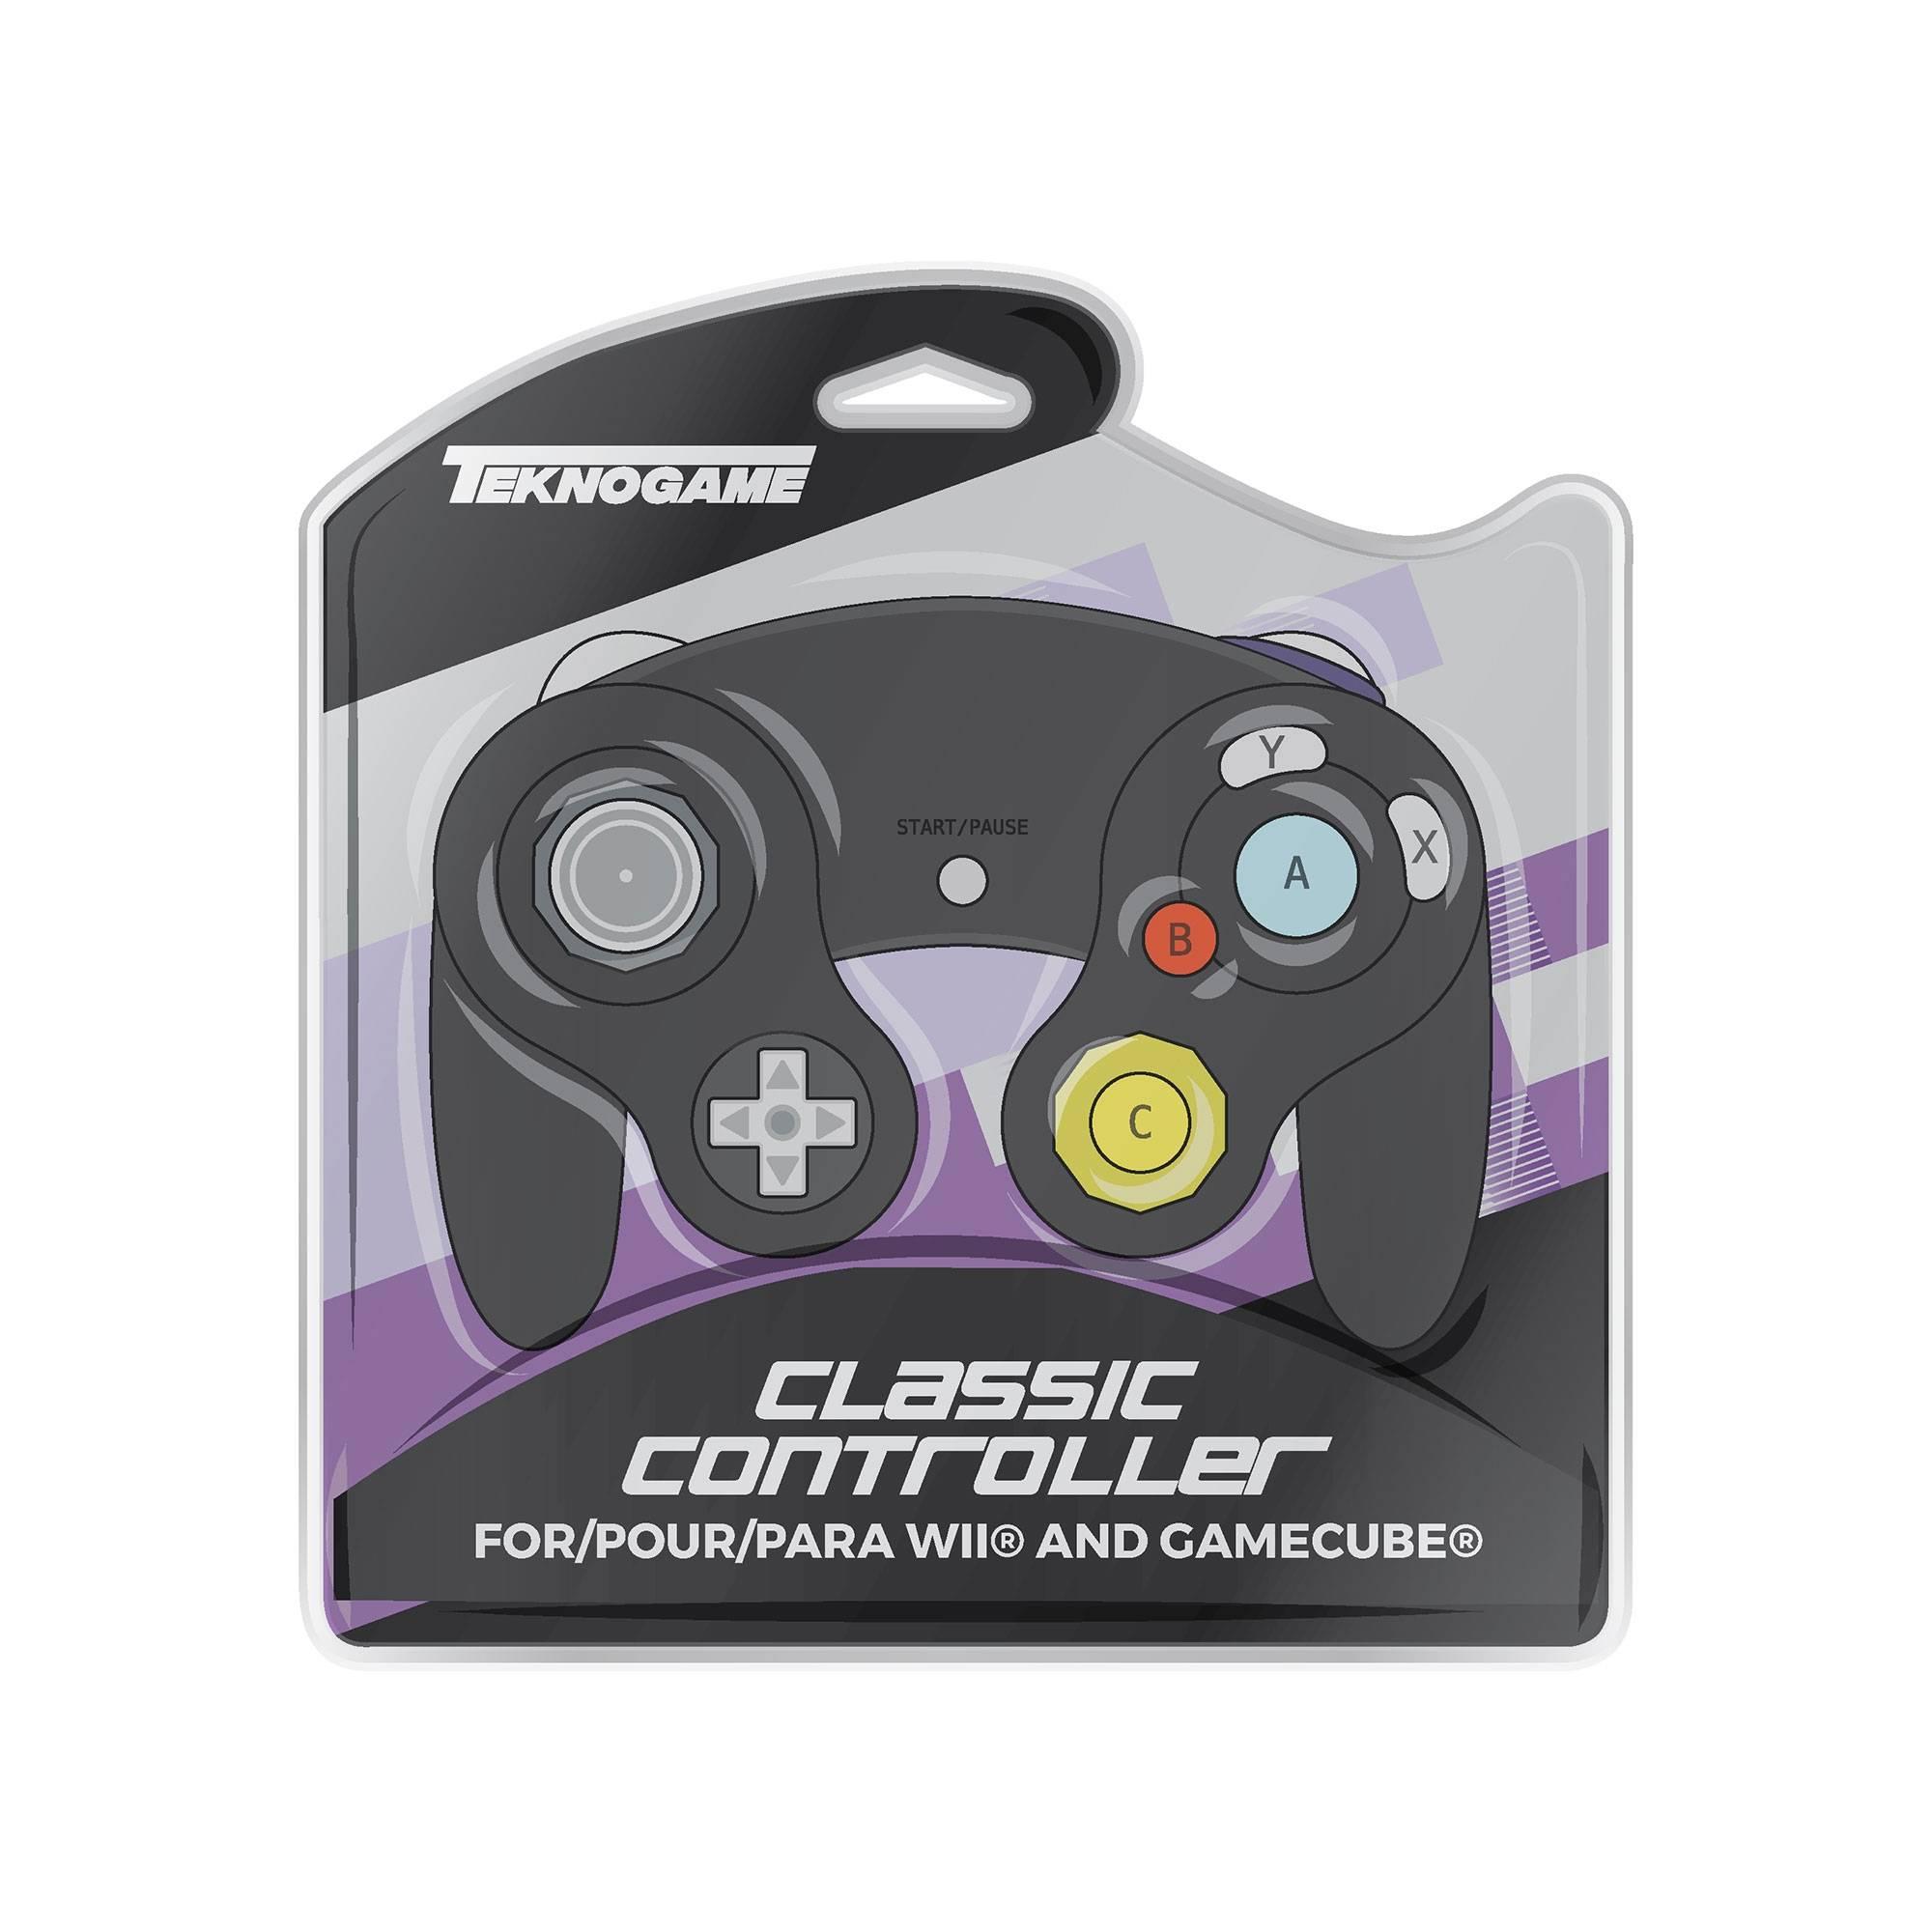 Gamecube kontroller för Gamecube, Wii, Wii U, Switch - Svart